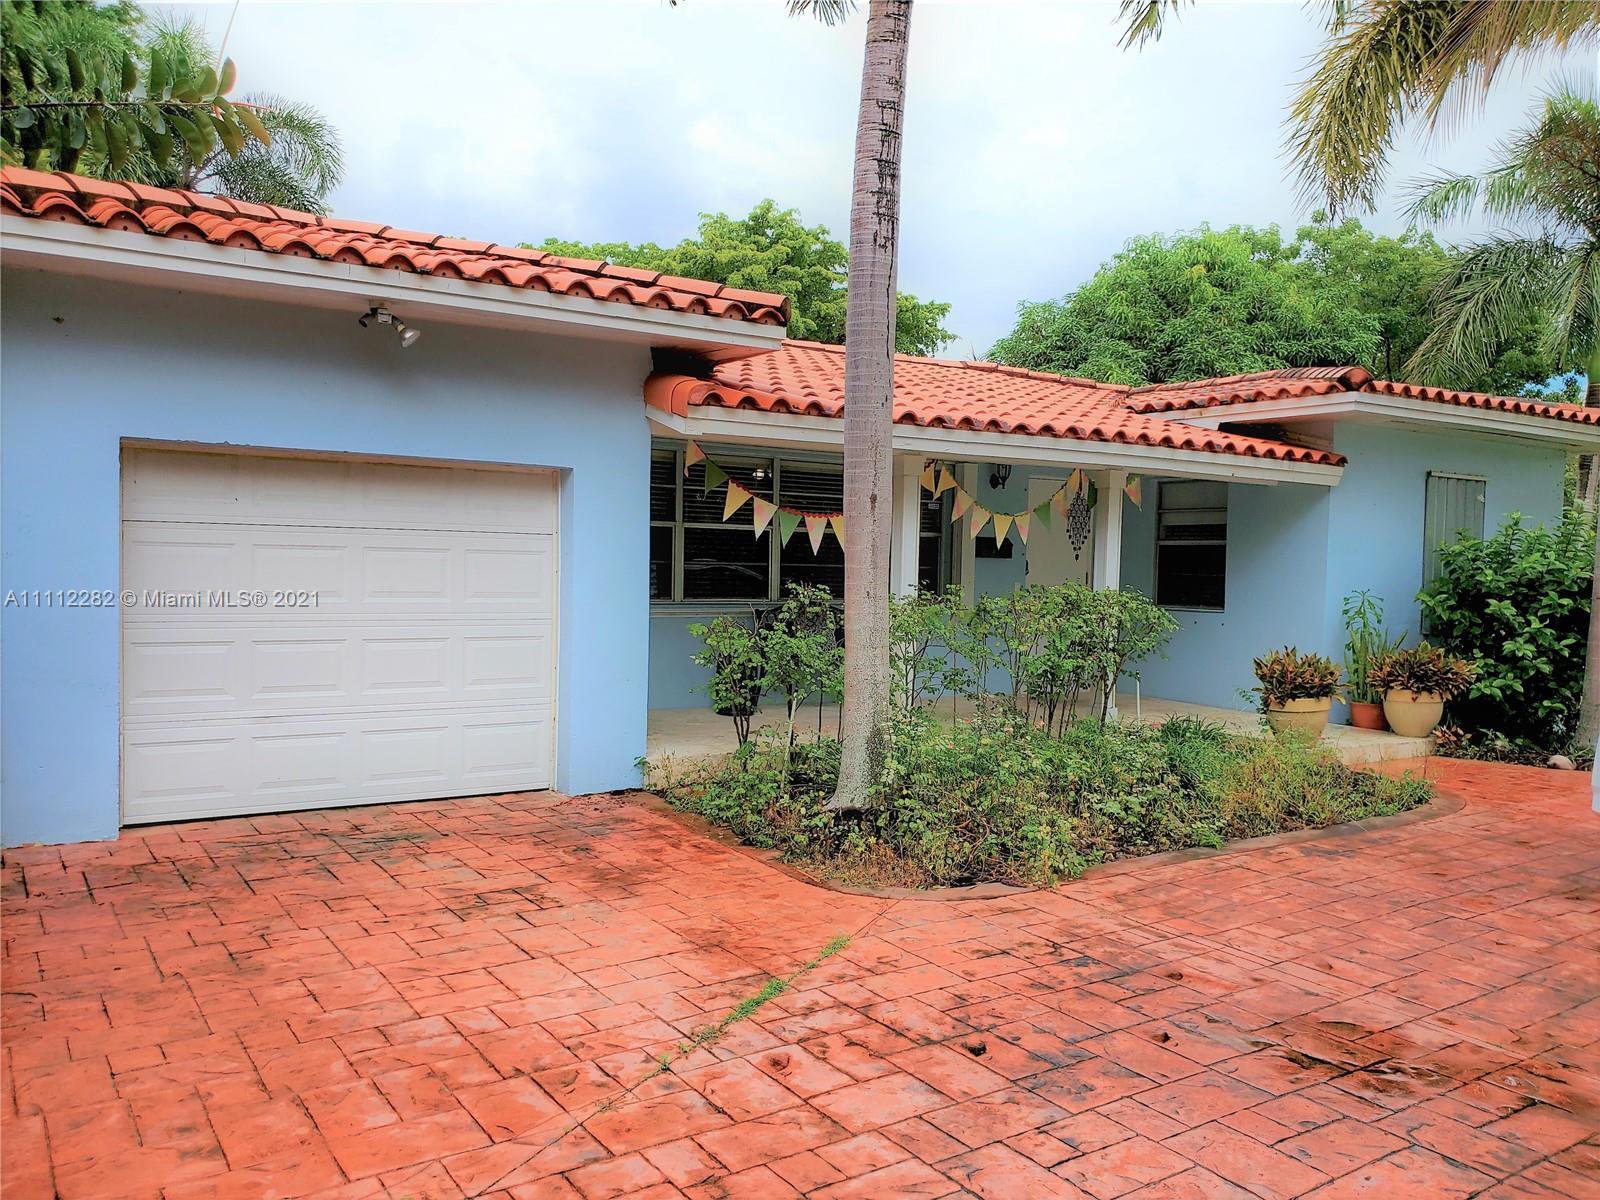 Single Family Home,For Sale,2099 NE 182nd St, North Miami Beach, Florida 33162,Brickell,realty,broker,condos near me